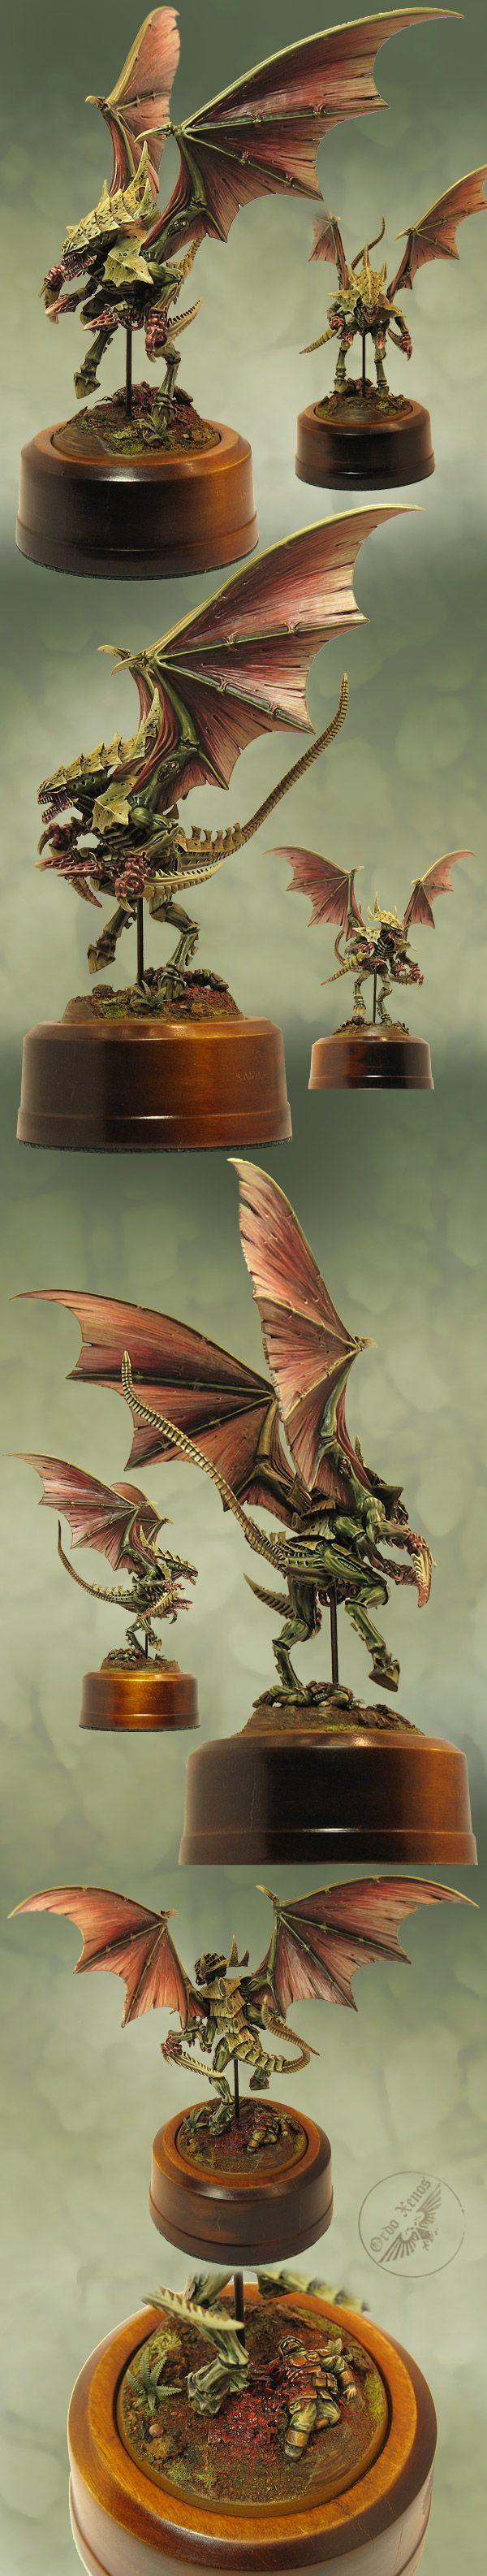 Tyranid winged Hive Tyrant (Forgeworld)